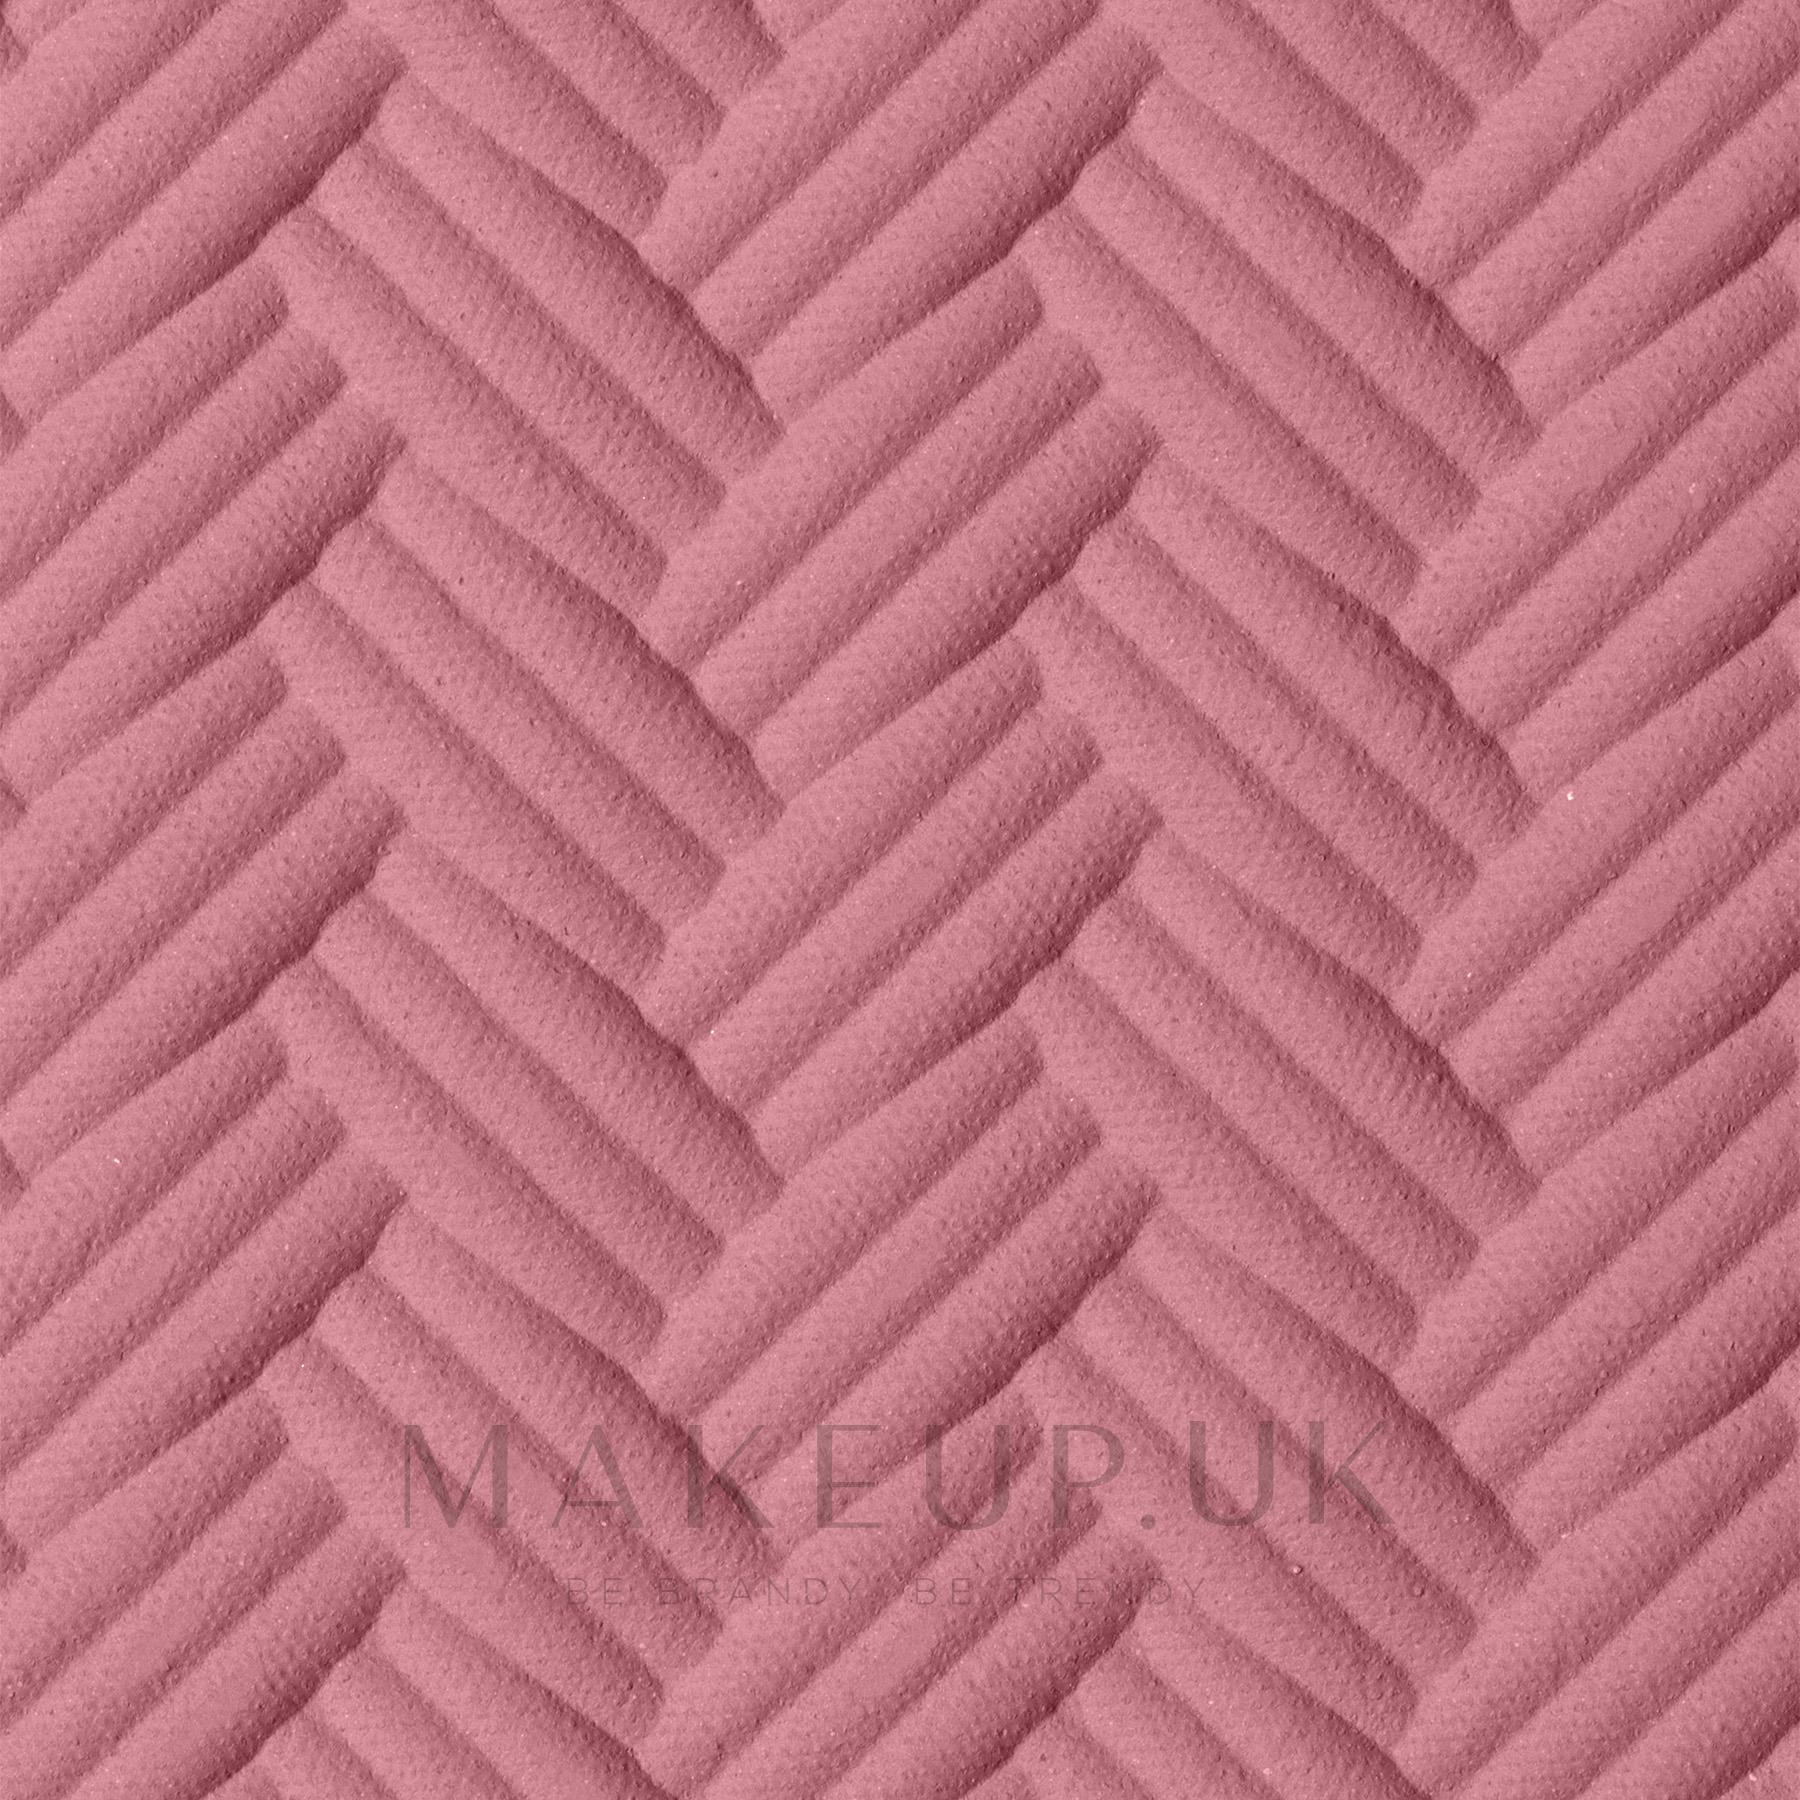 Pressed Blush - Affect Cosmetics Velour Blush On — photo R-0122 - Peony